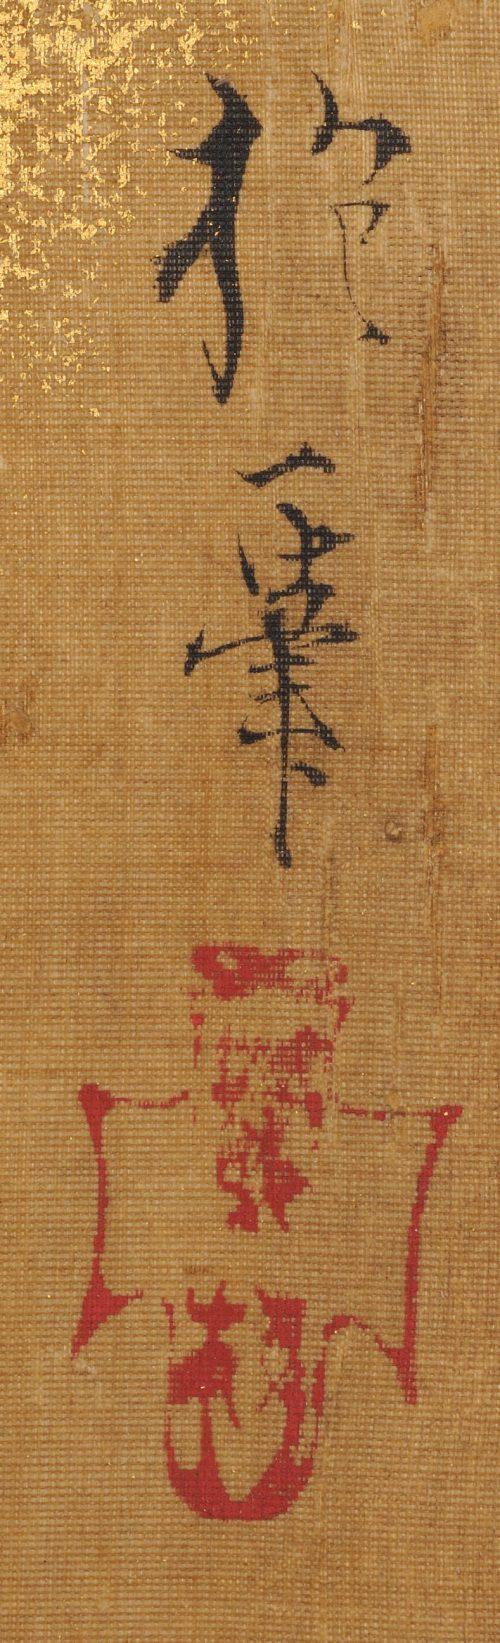 Japanese Rinpa artist Sakai Hoitsu. Rimpa school folding screen. Japanese flower painting. Image of signature and seal.